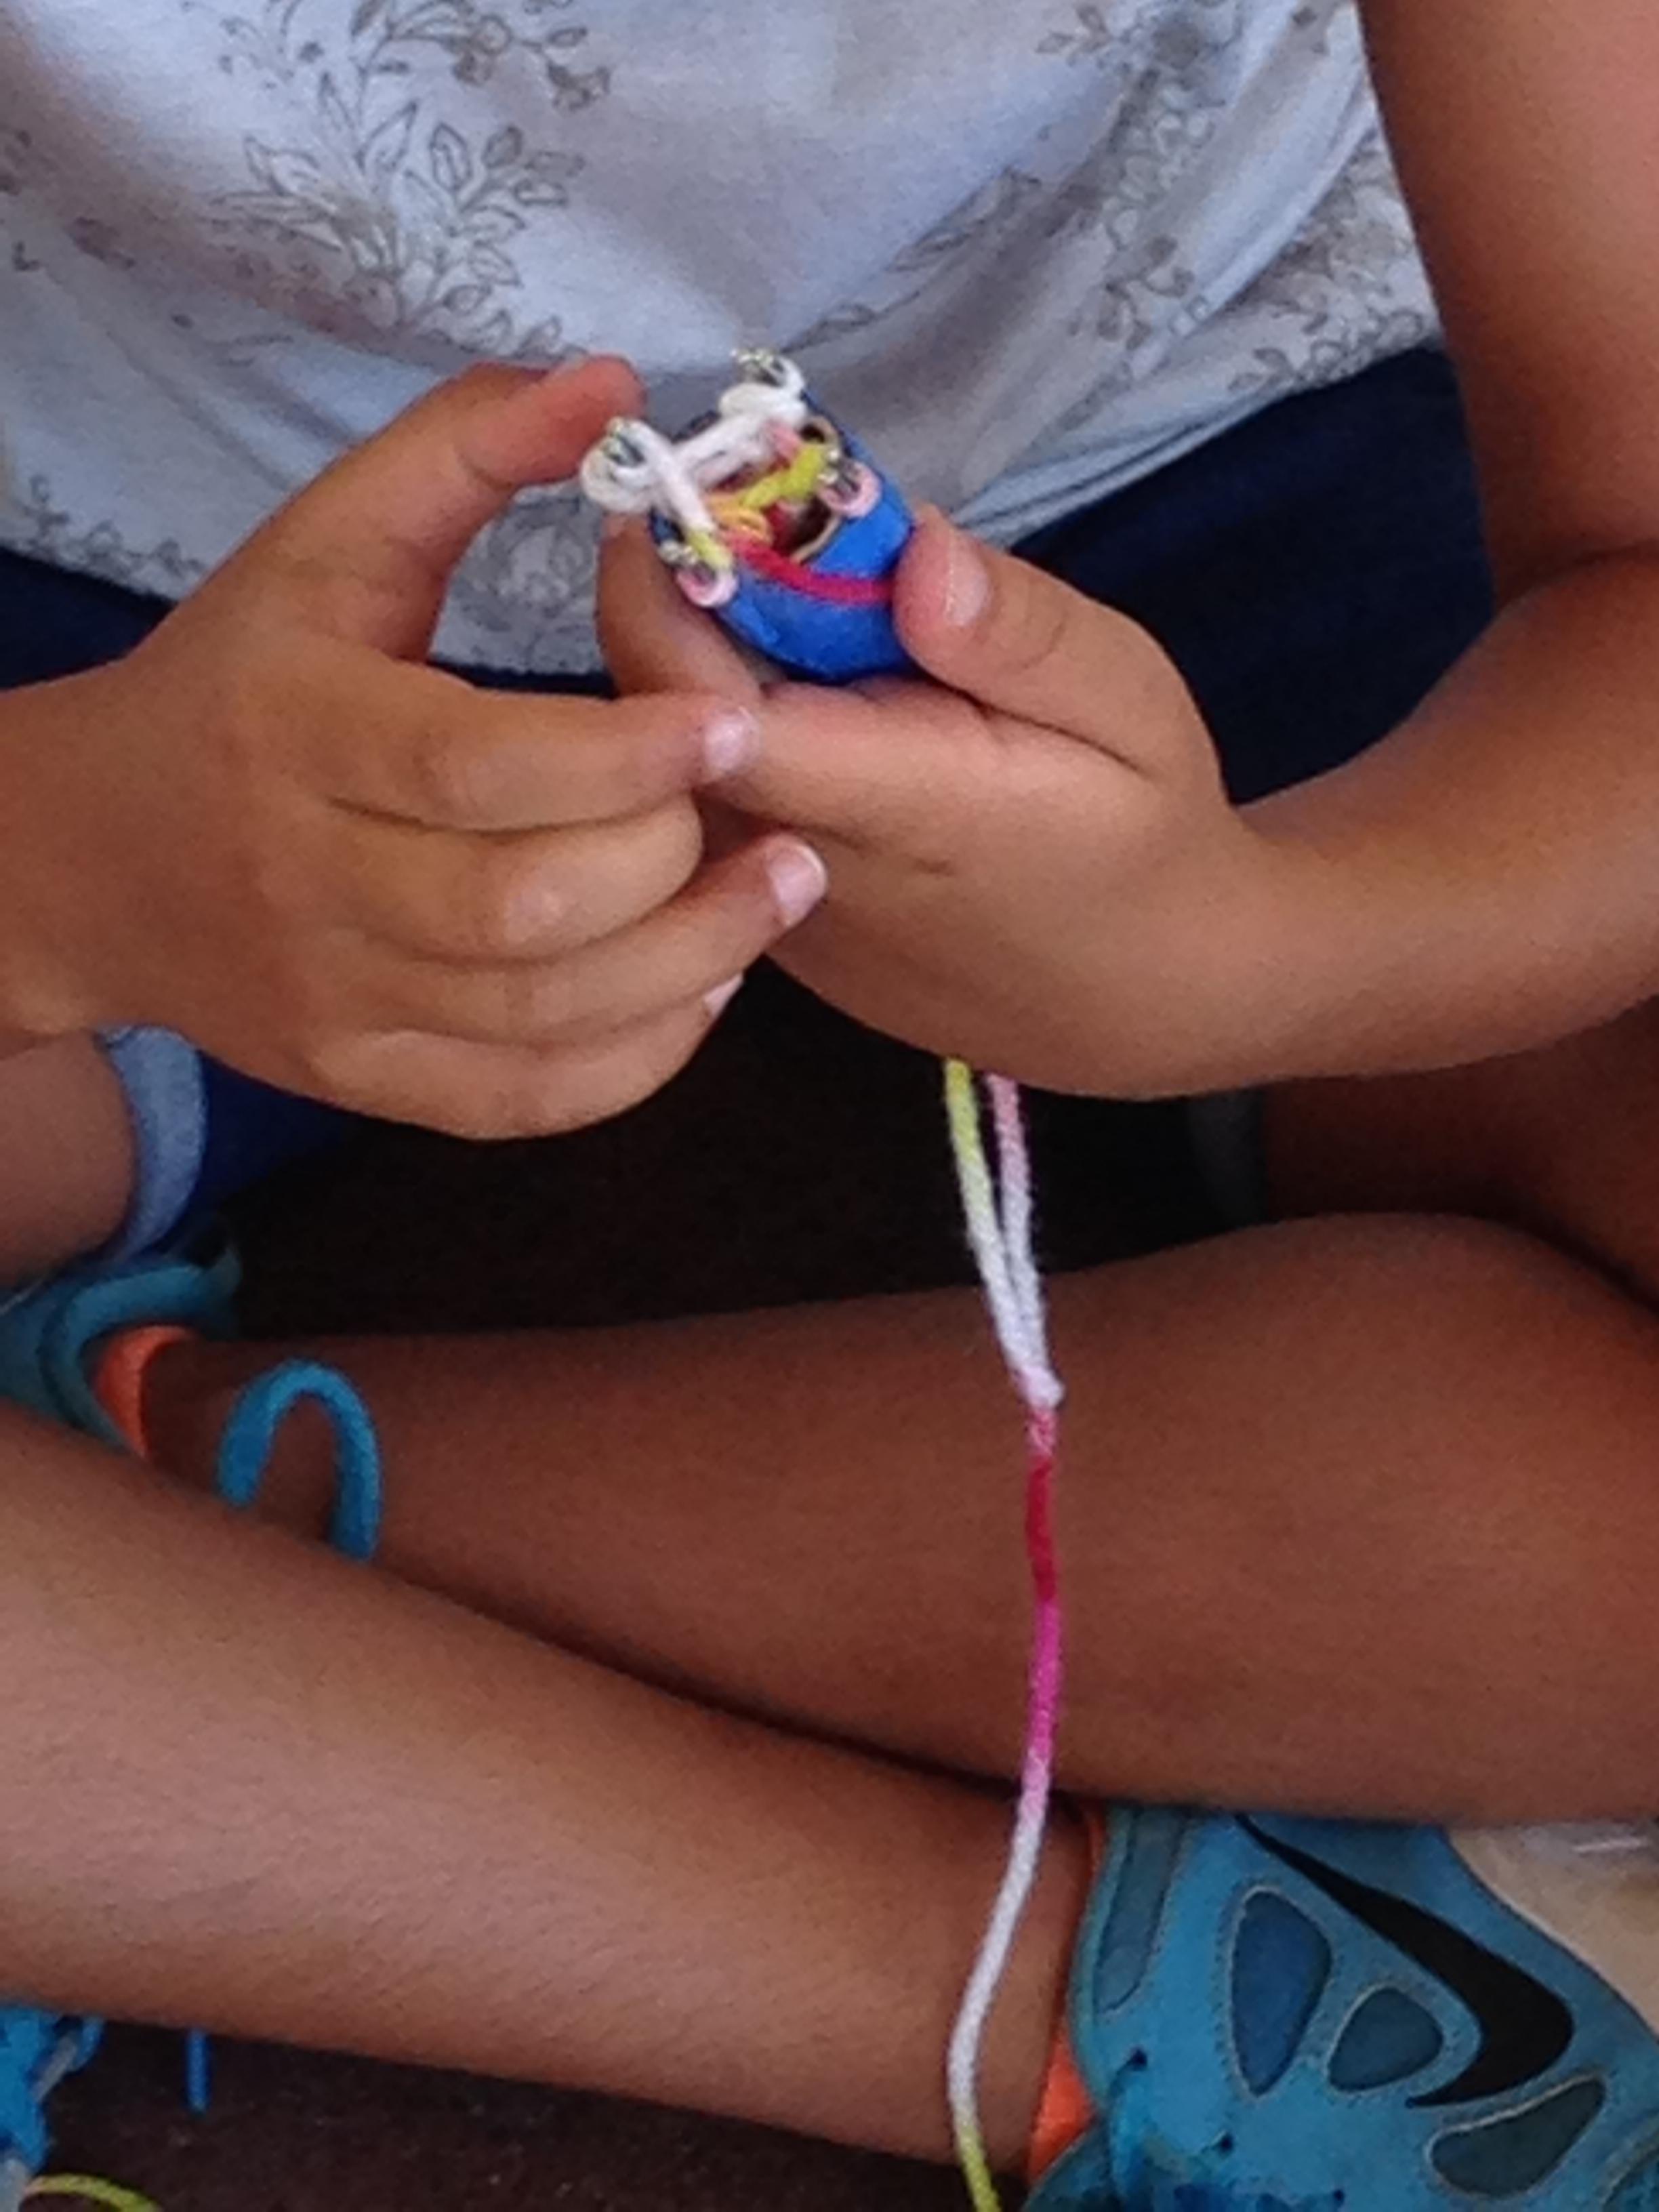 Spool knitting at break time.